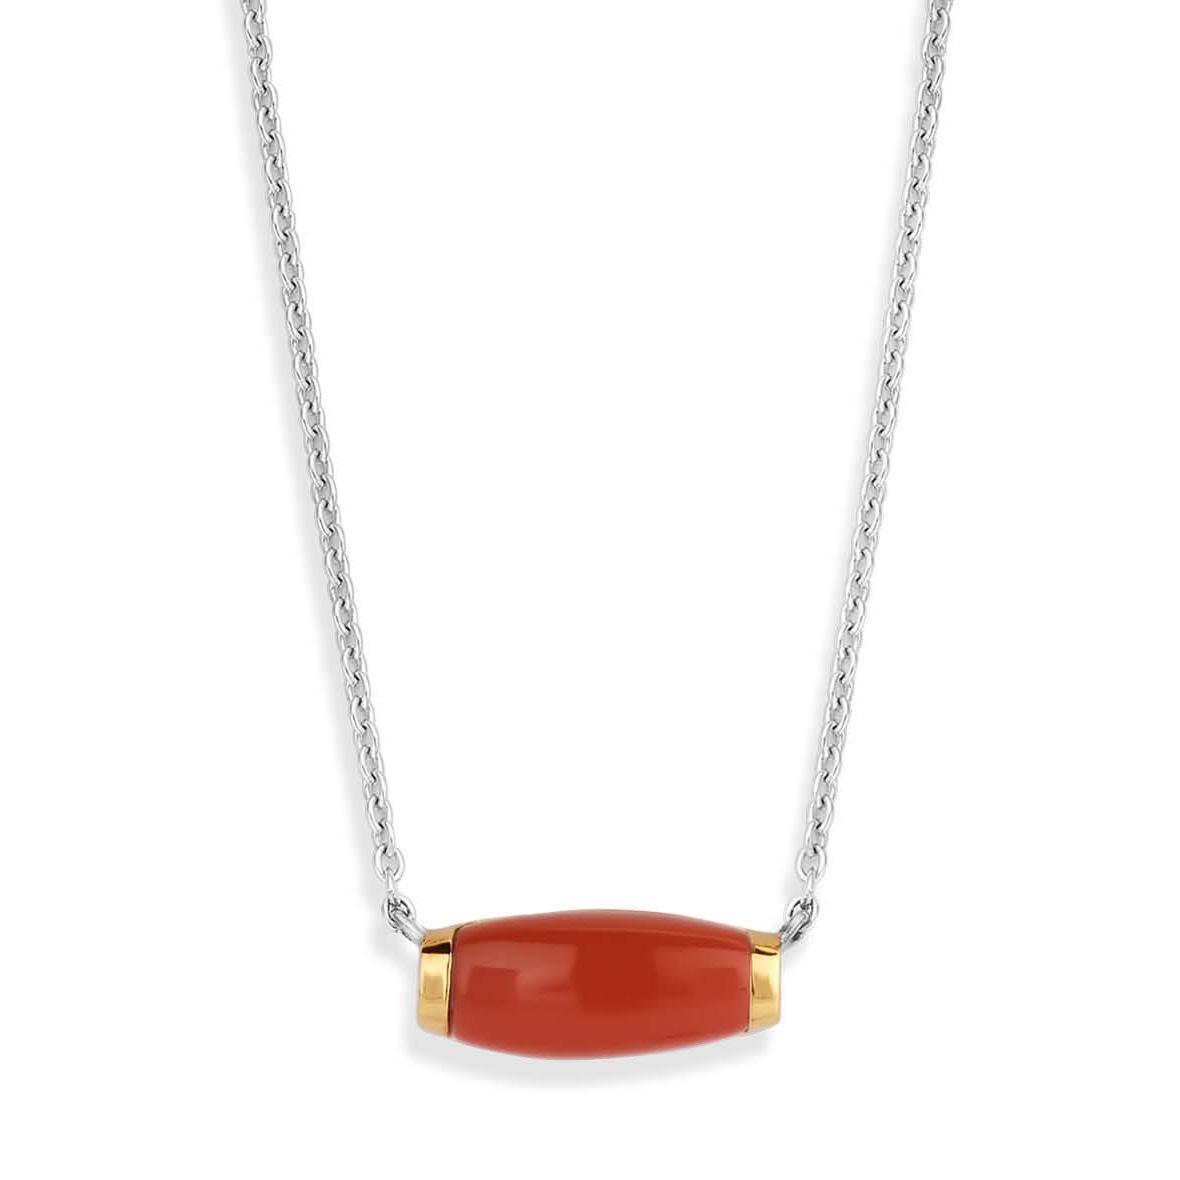 TI SENTO-Milano Ketting 3942CR zilver goudkleurig-rood 38-48 cm